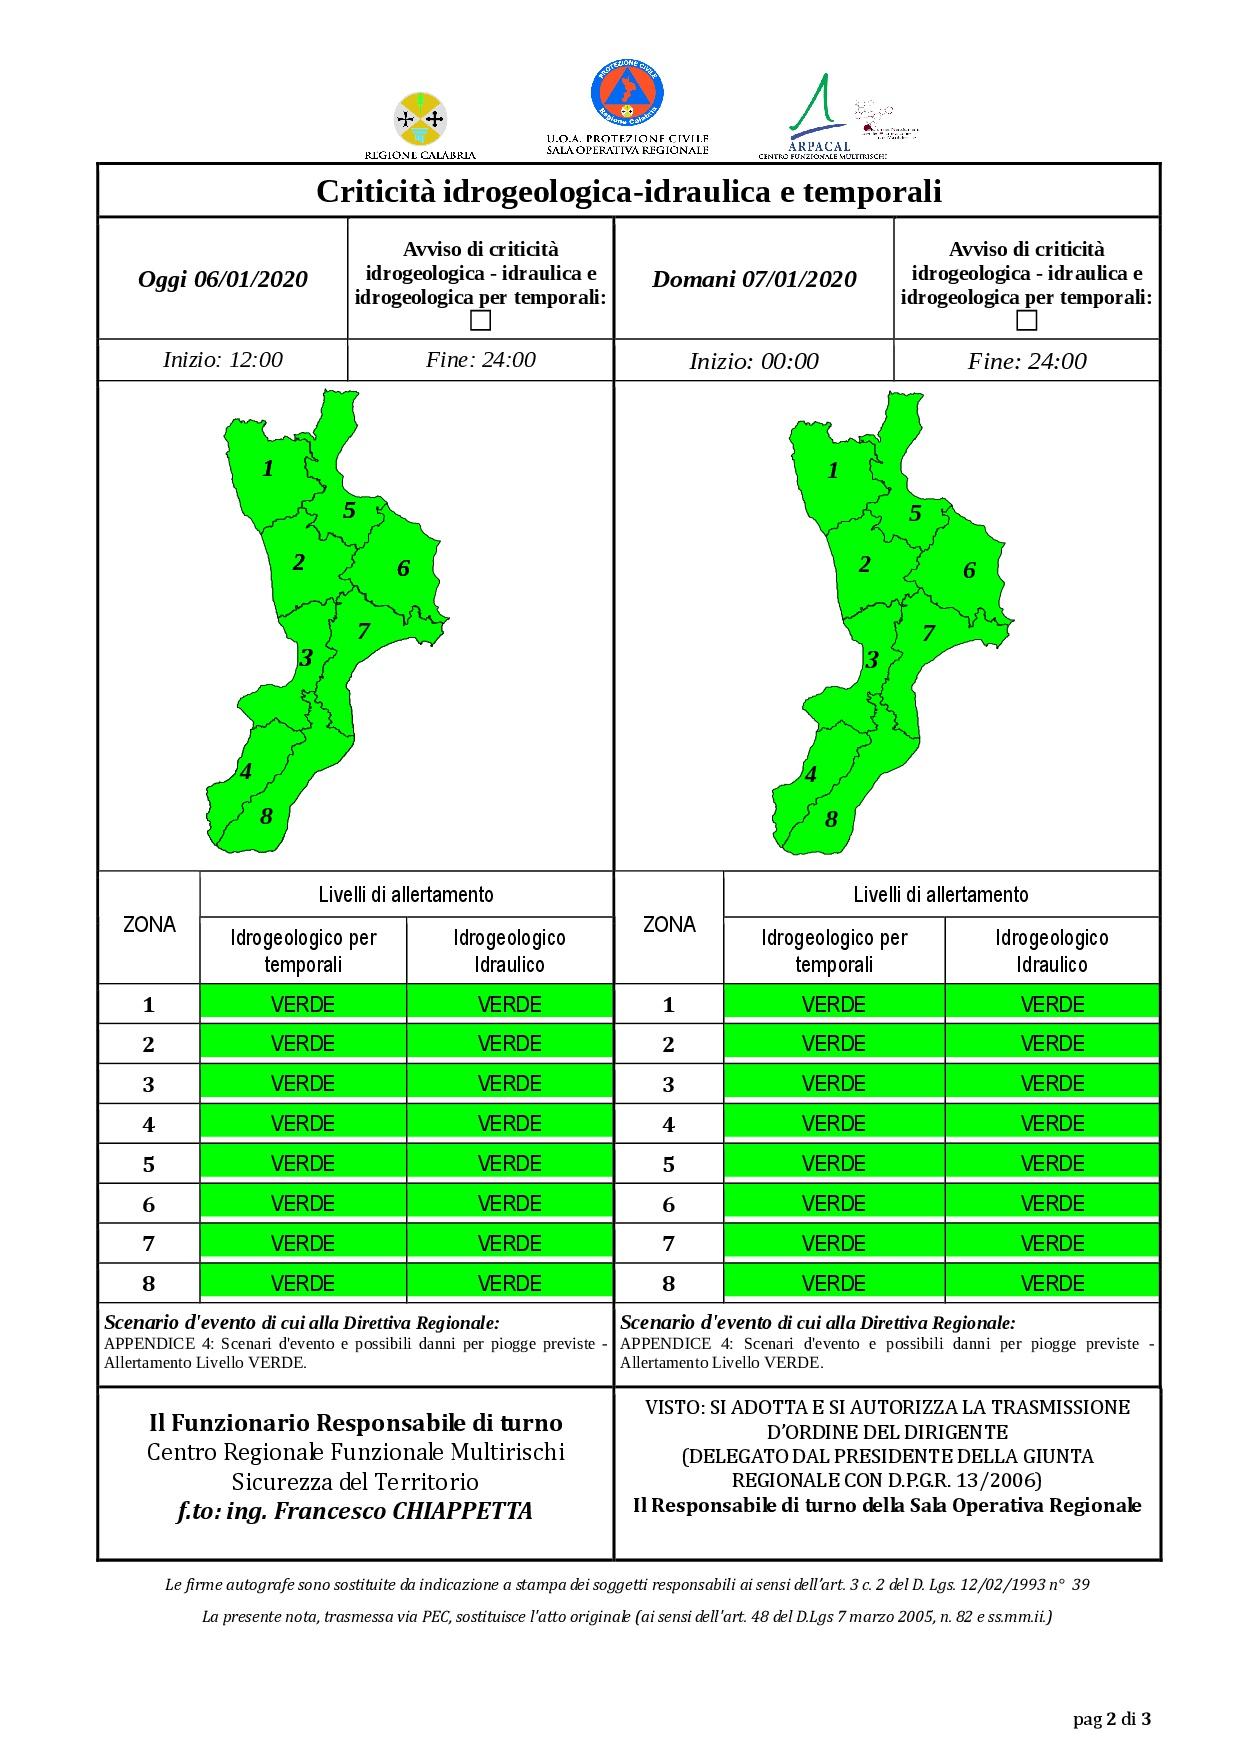 Criticità idrogeologica-idraulica e temporali in Calabria 06-01-2020